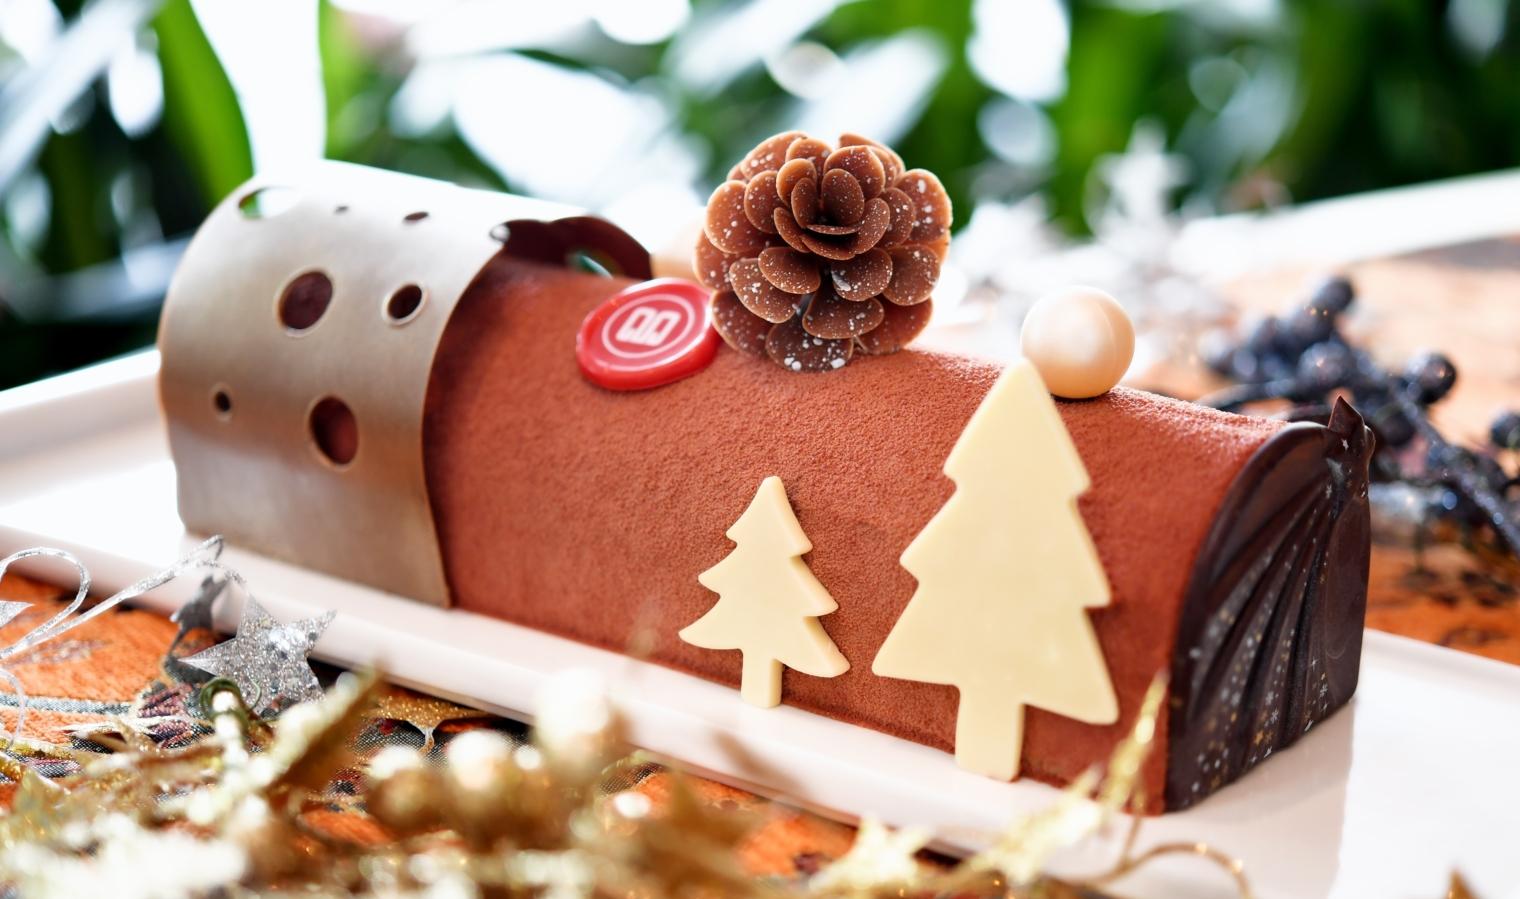 The Santa Chocolate Yule Log at Marina Mandarin (Photo credit: Marina Mandarin)